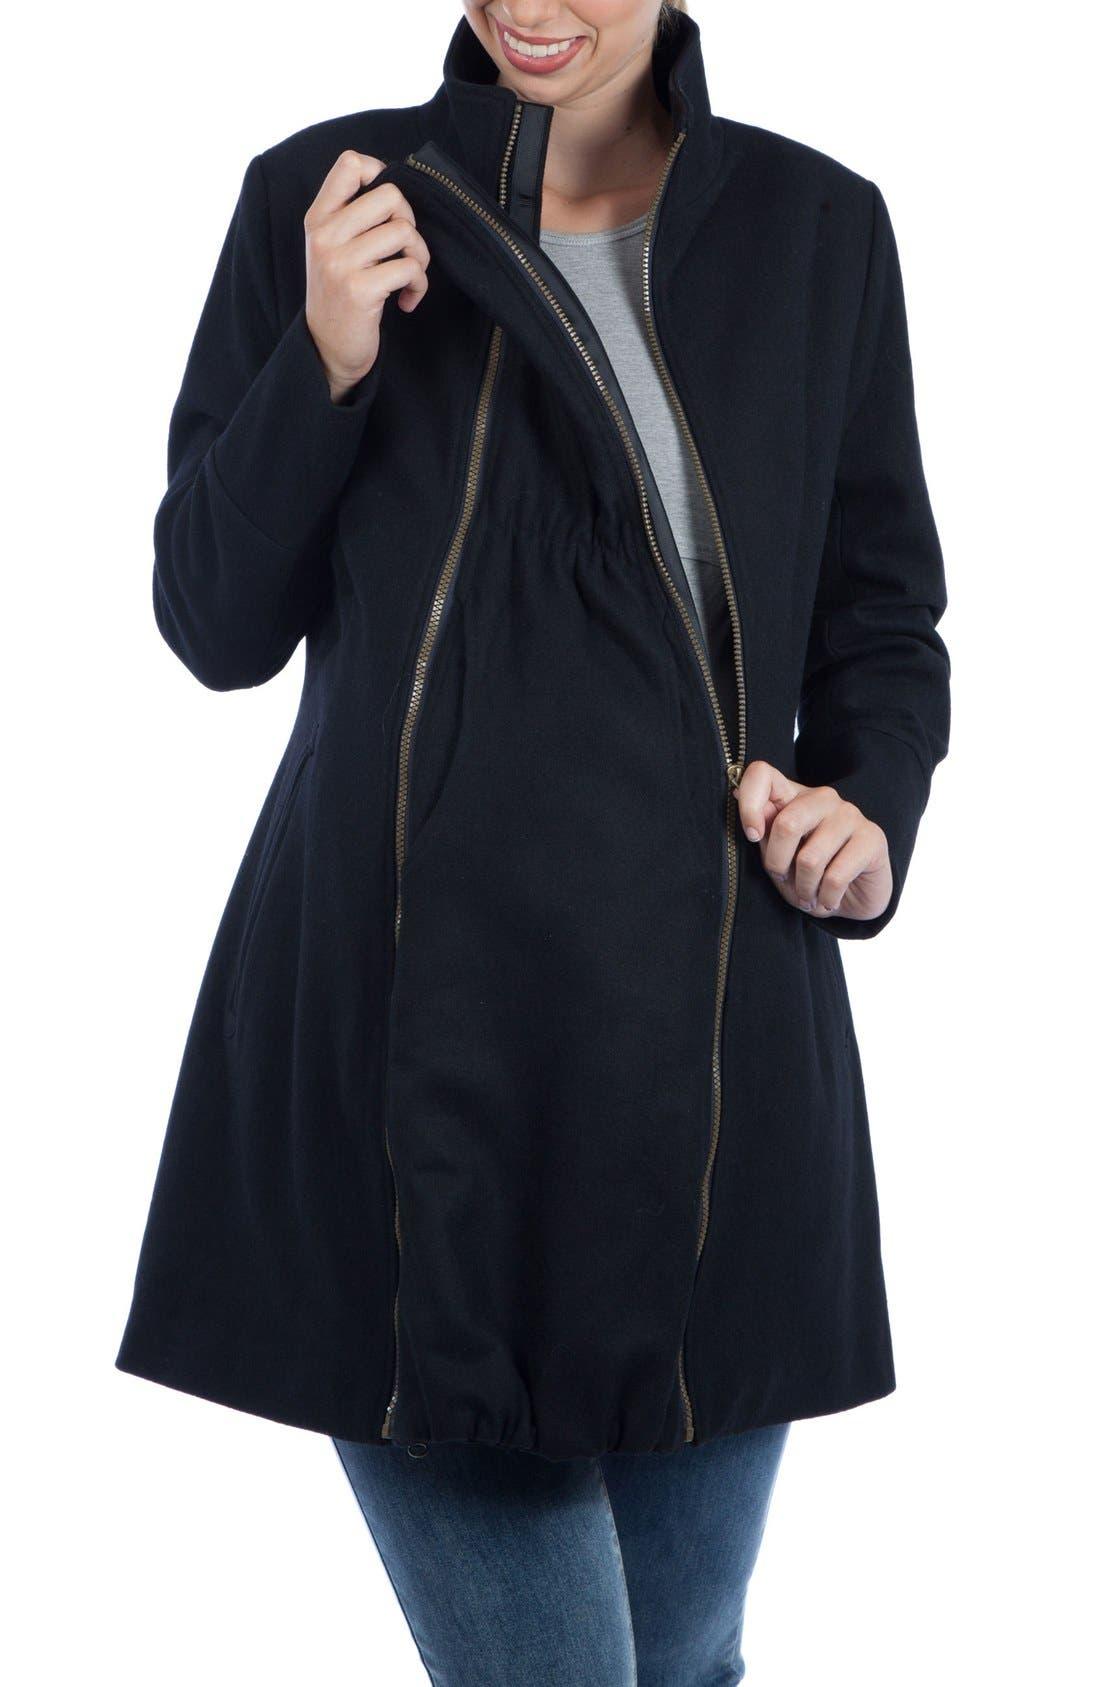 Convertible 3-in-1 Maternity/Nursing Coat,                             Alternate thumbnail 9, color,                             BLACK